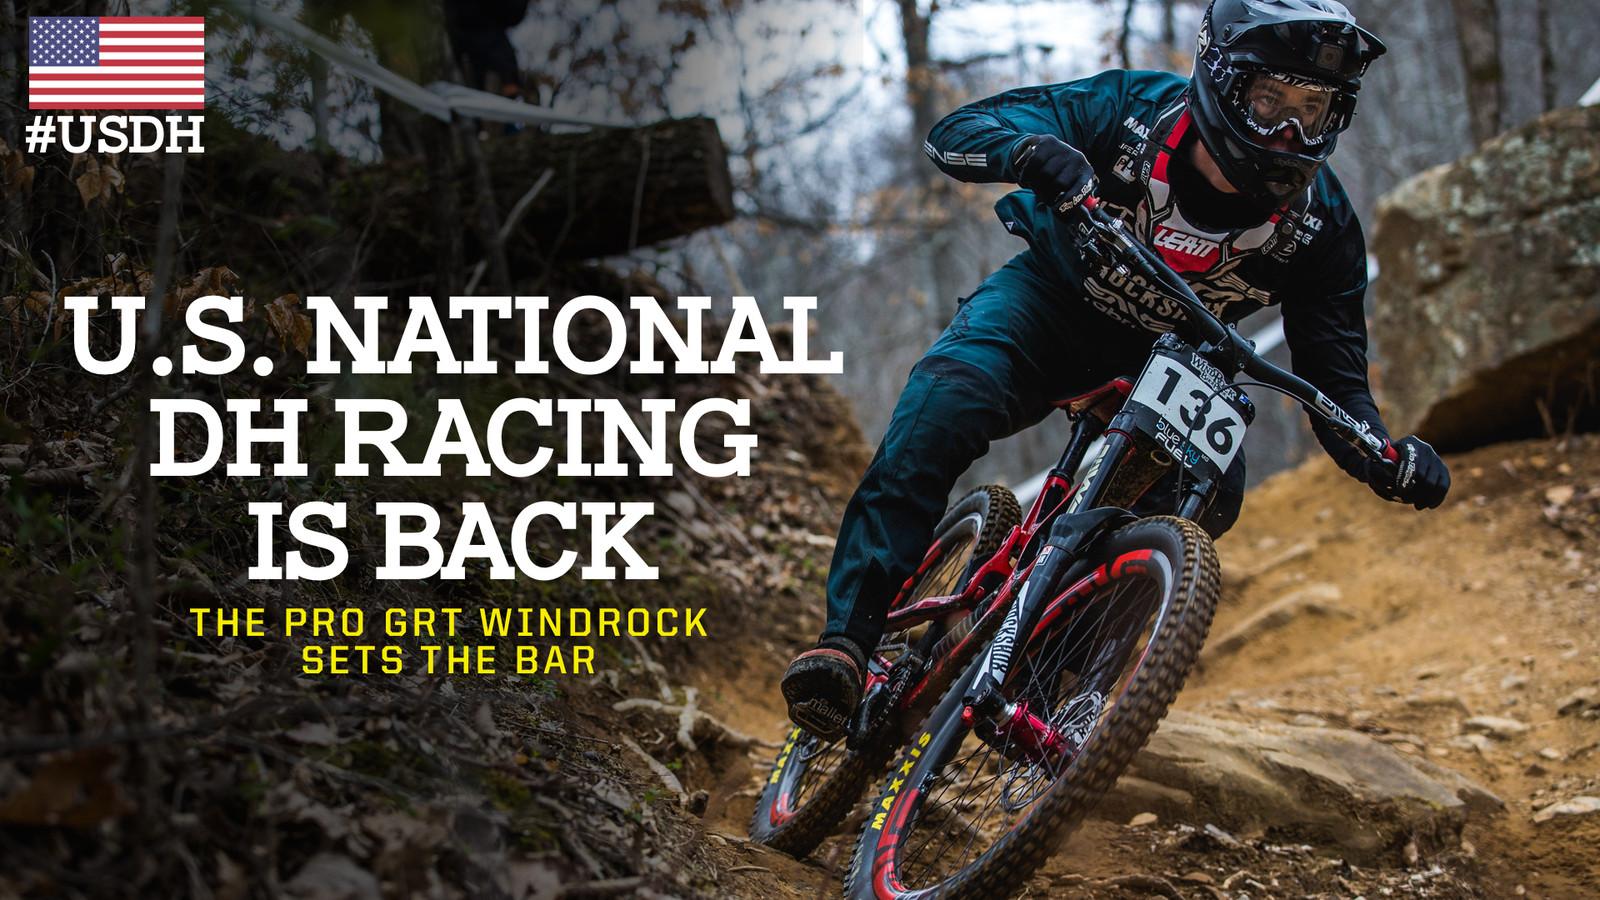 U.S. National Downhill Racing is Back